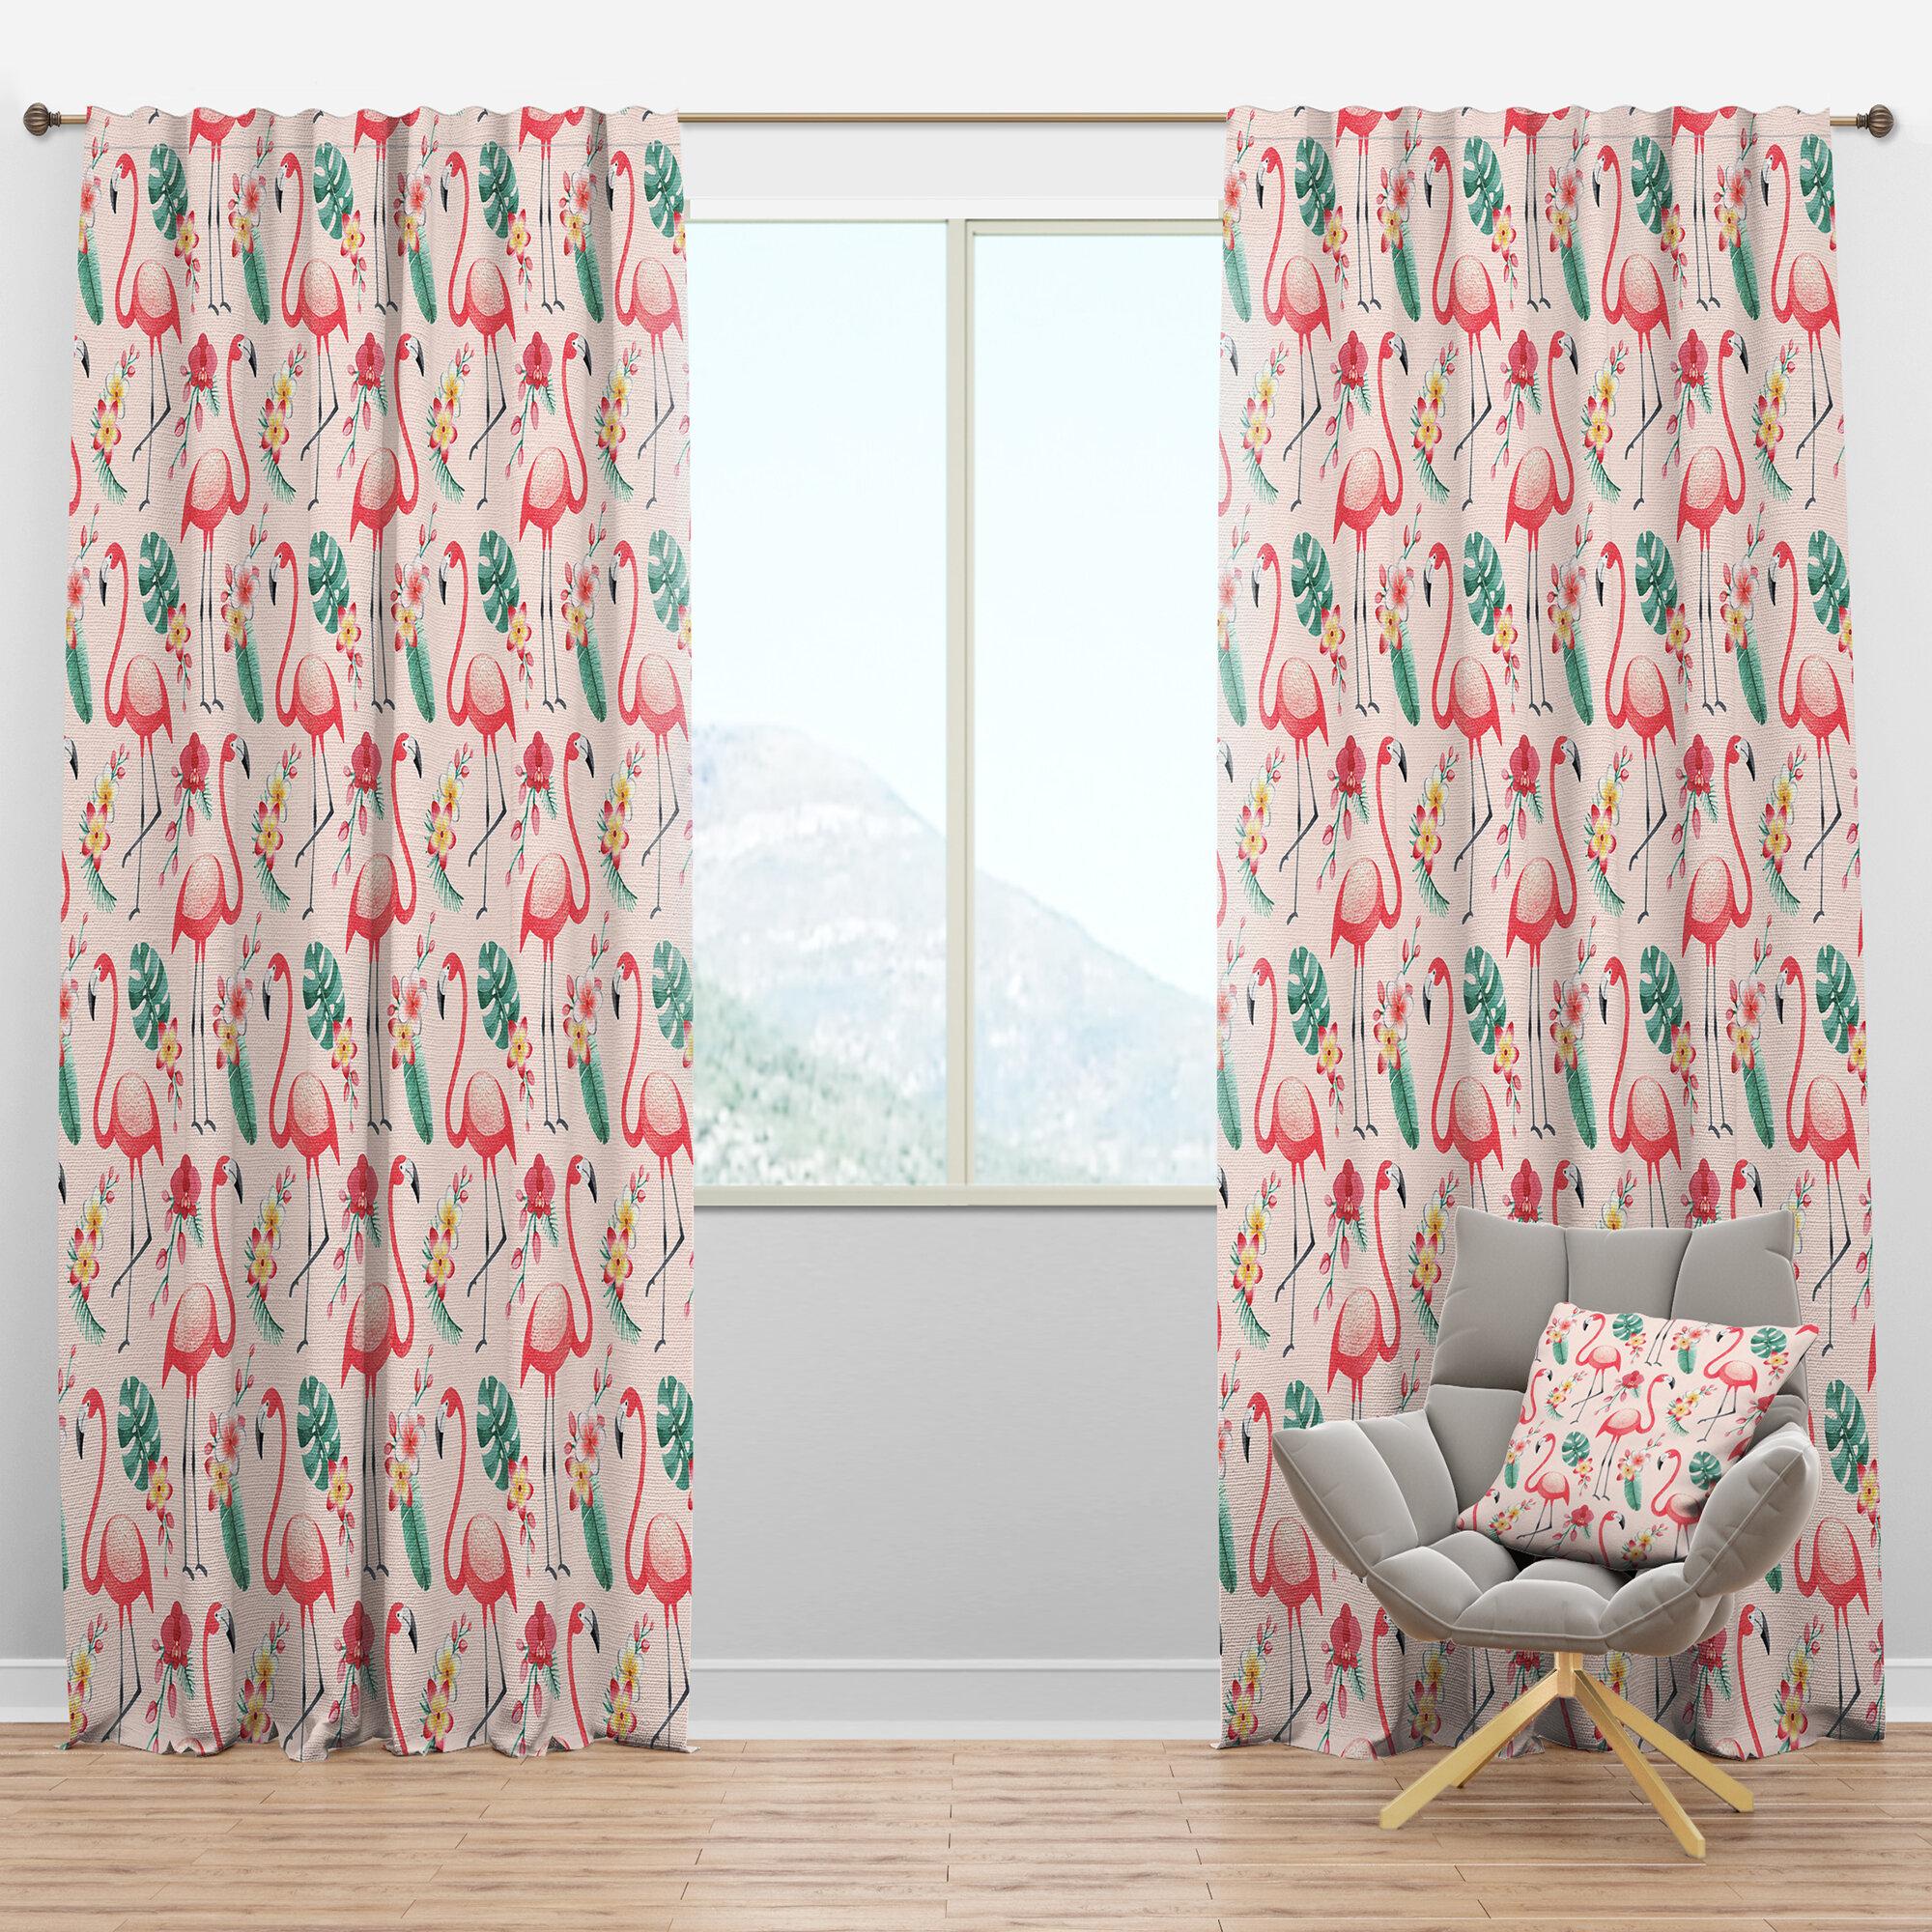 Designart Mid Century Tropical Botanicals And Flamingo Ii Floral Semi Sheer Thermal Rod Pocket Single Curtain Panel Wayfair